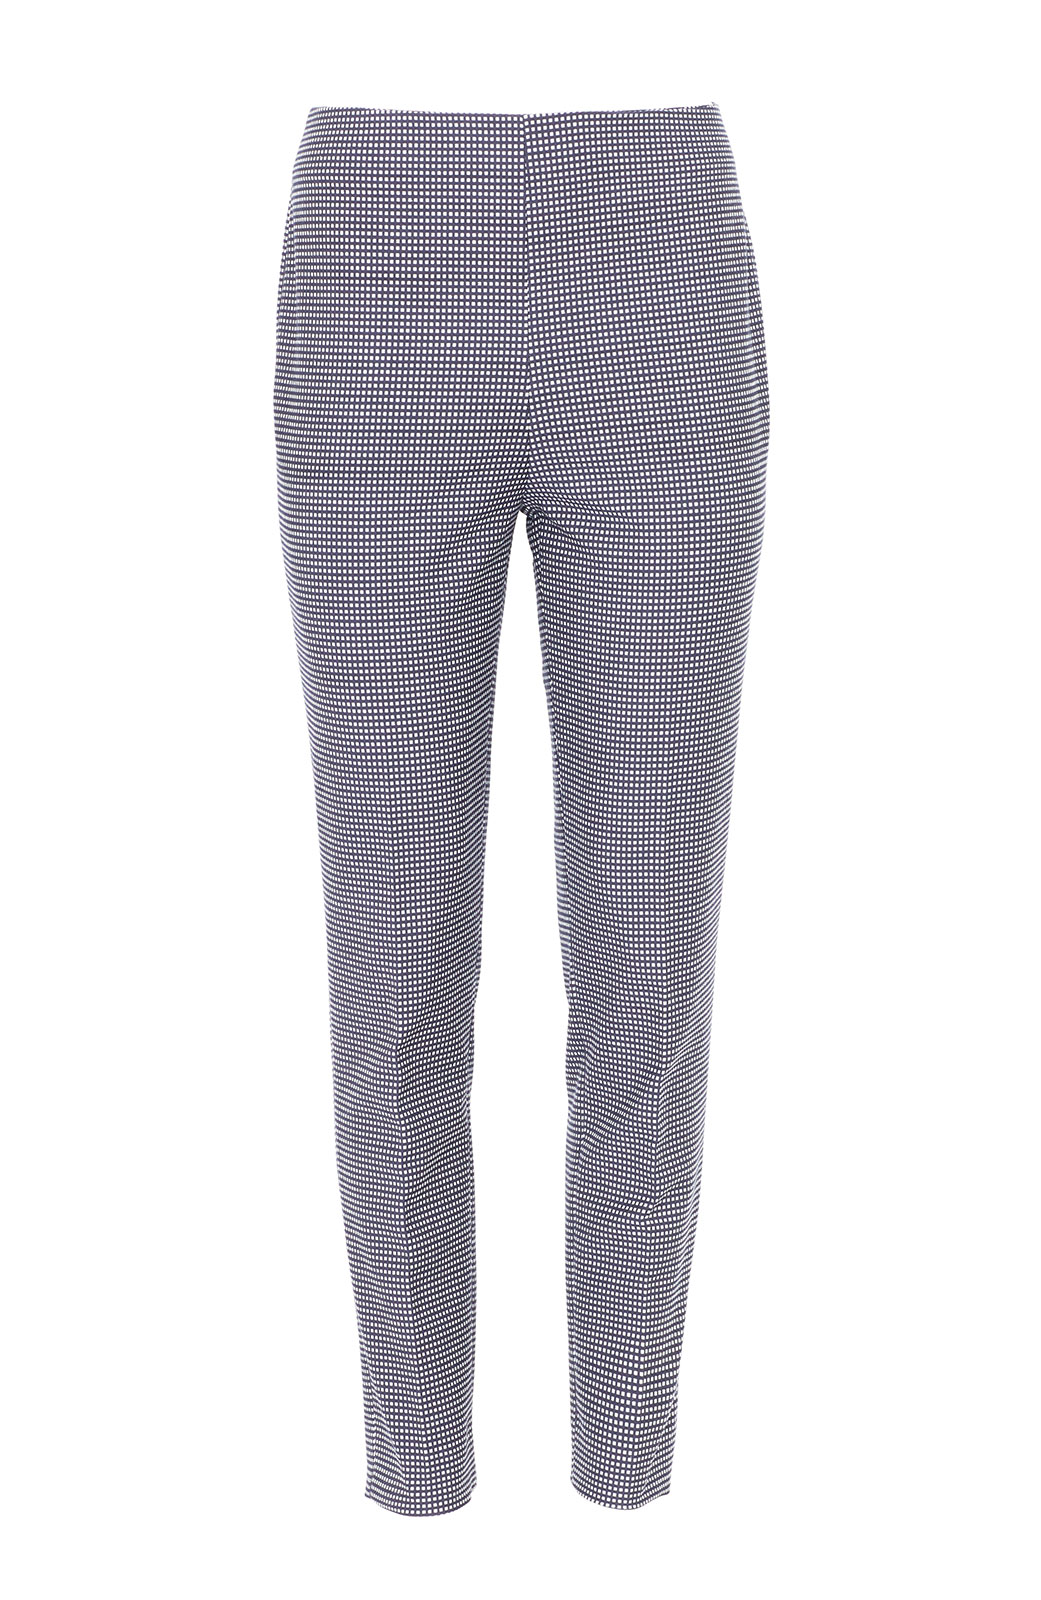 <ul><li>Checked stretch jacquard slim, straight leg Susie pant</li><li>High-rise, flat front with concealed zip fastening at center back</li><li>Cotton/Polyamide/Lycra</li><li>Dry clean</li><li>Made in USA</li></ul>